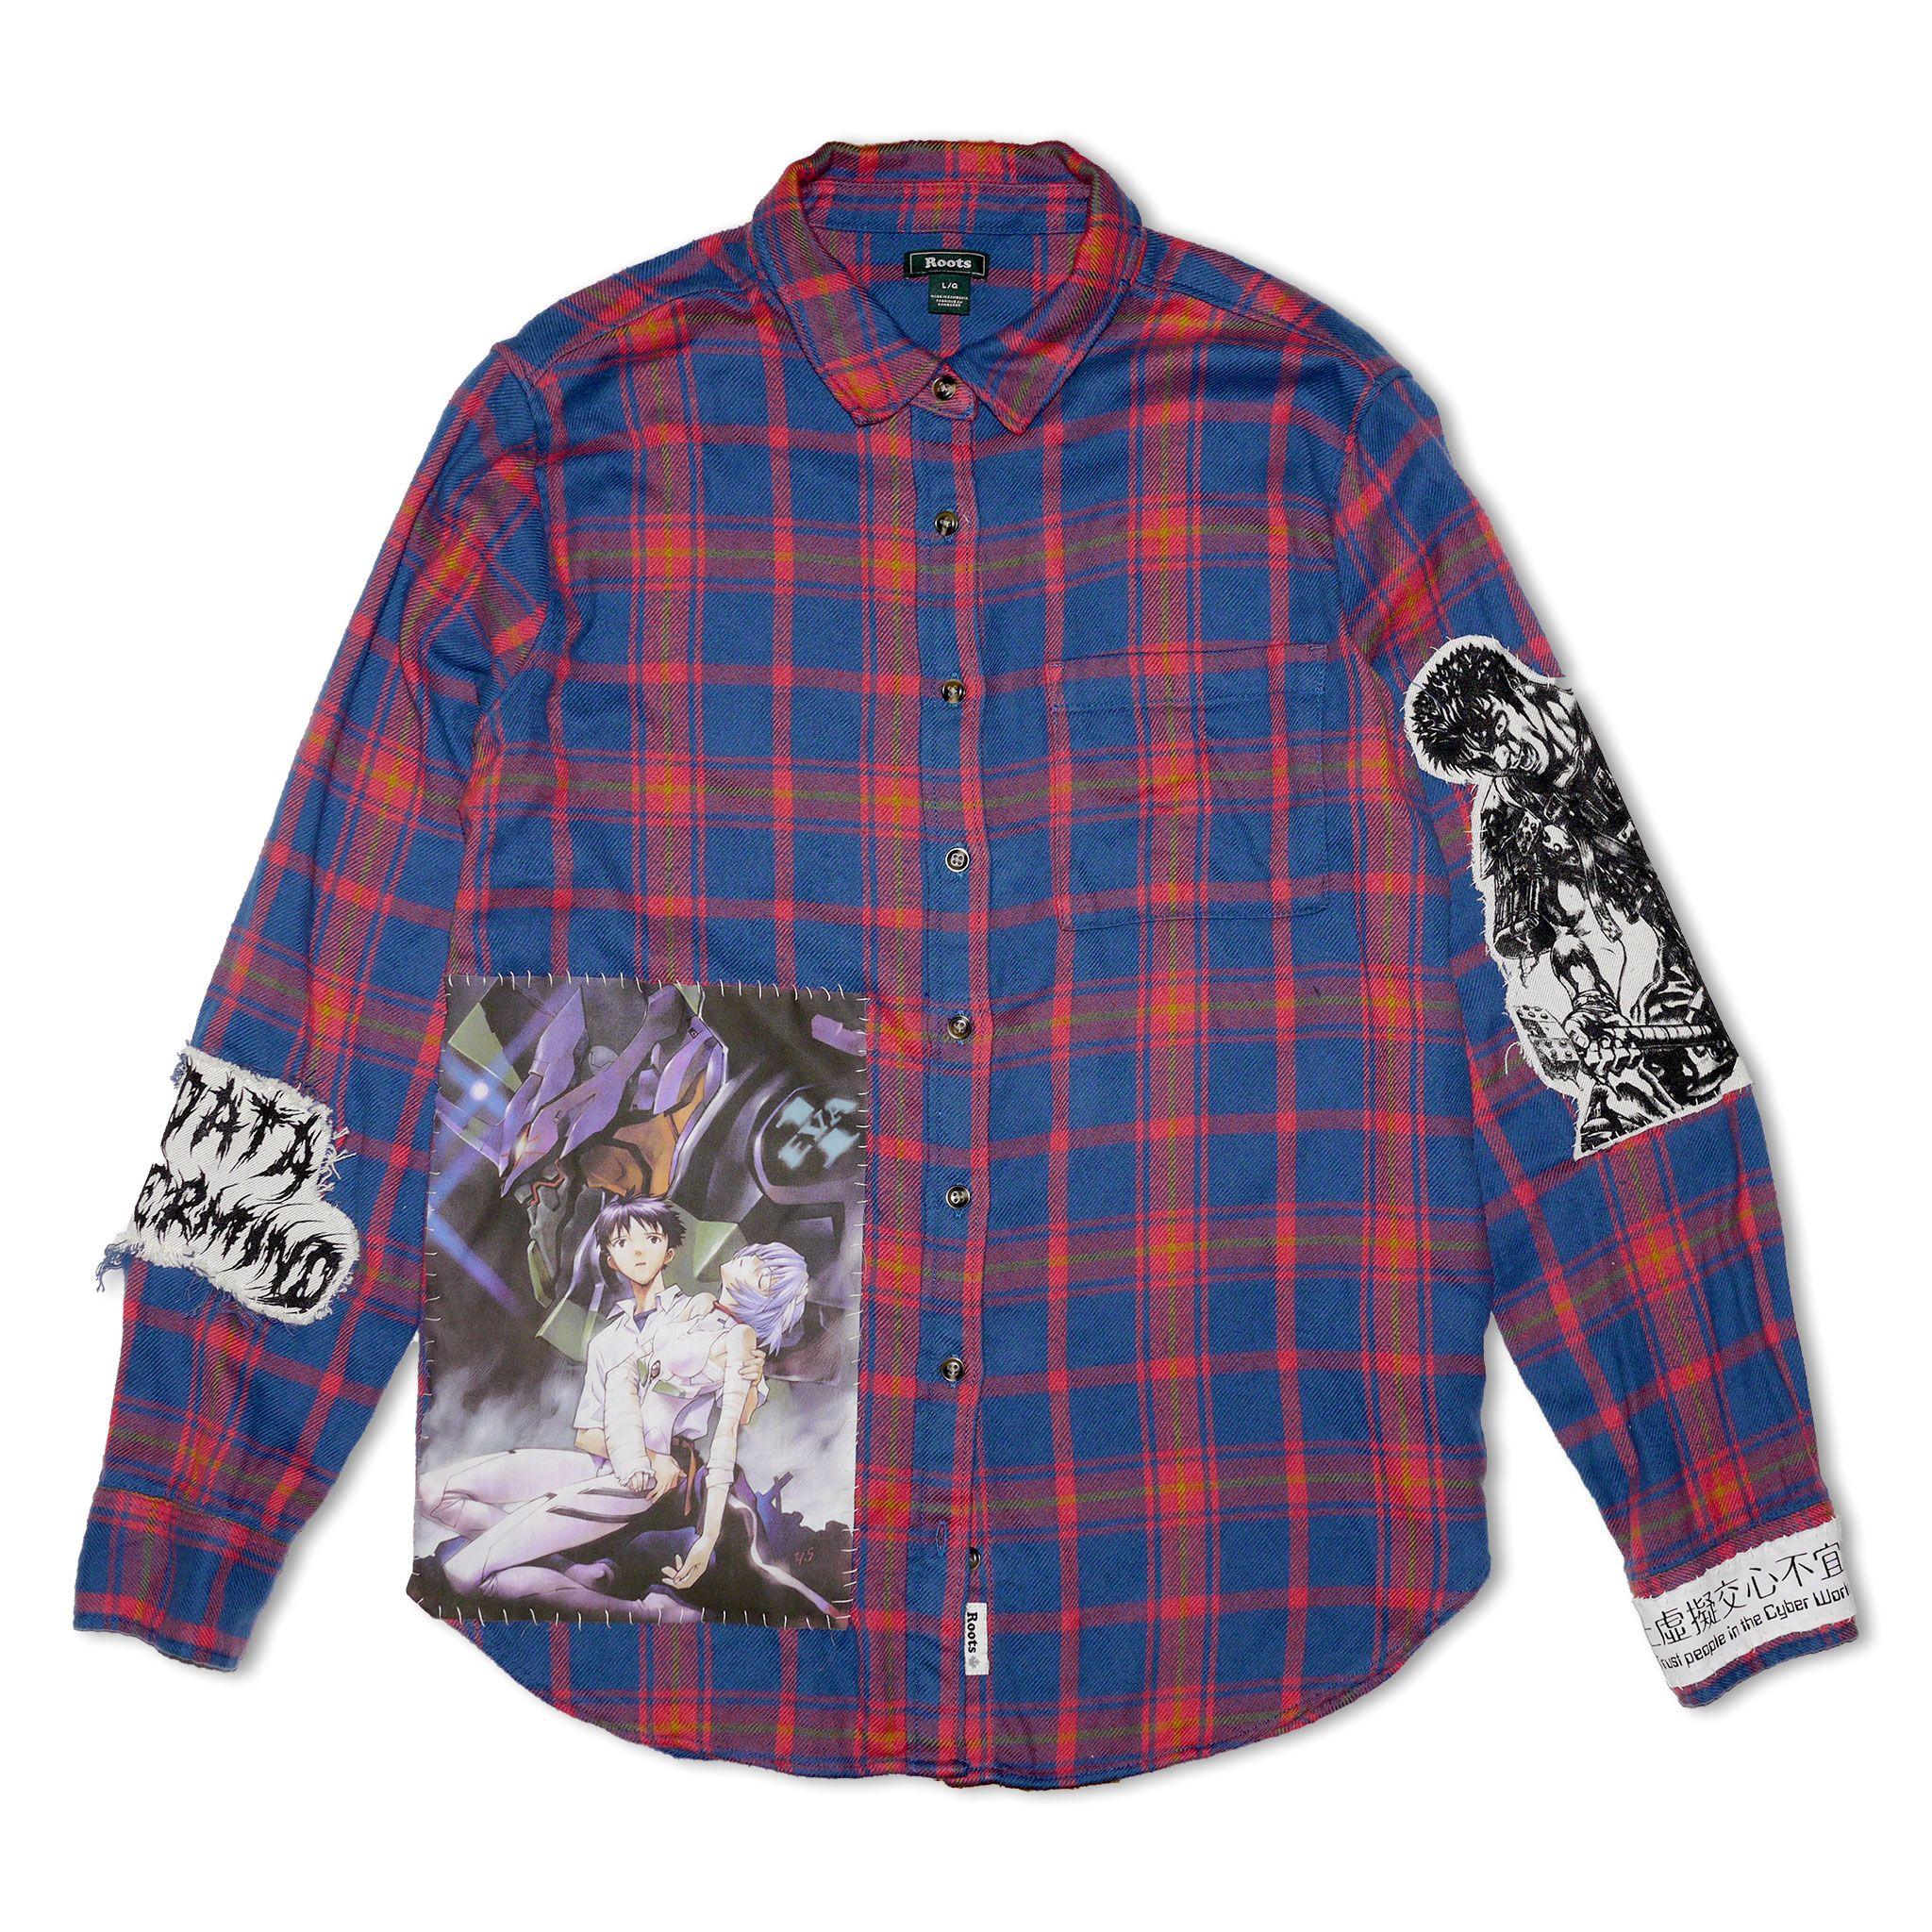 Data overmind 1 of 1 anime flannel shirt evangelion